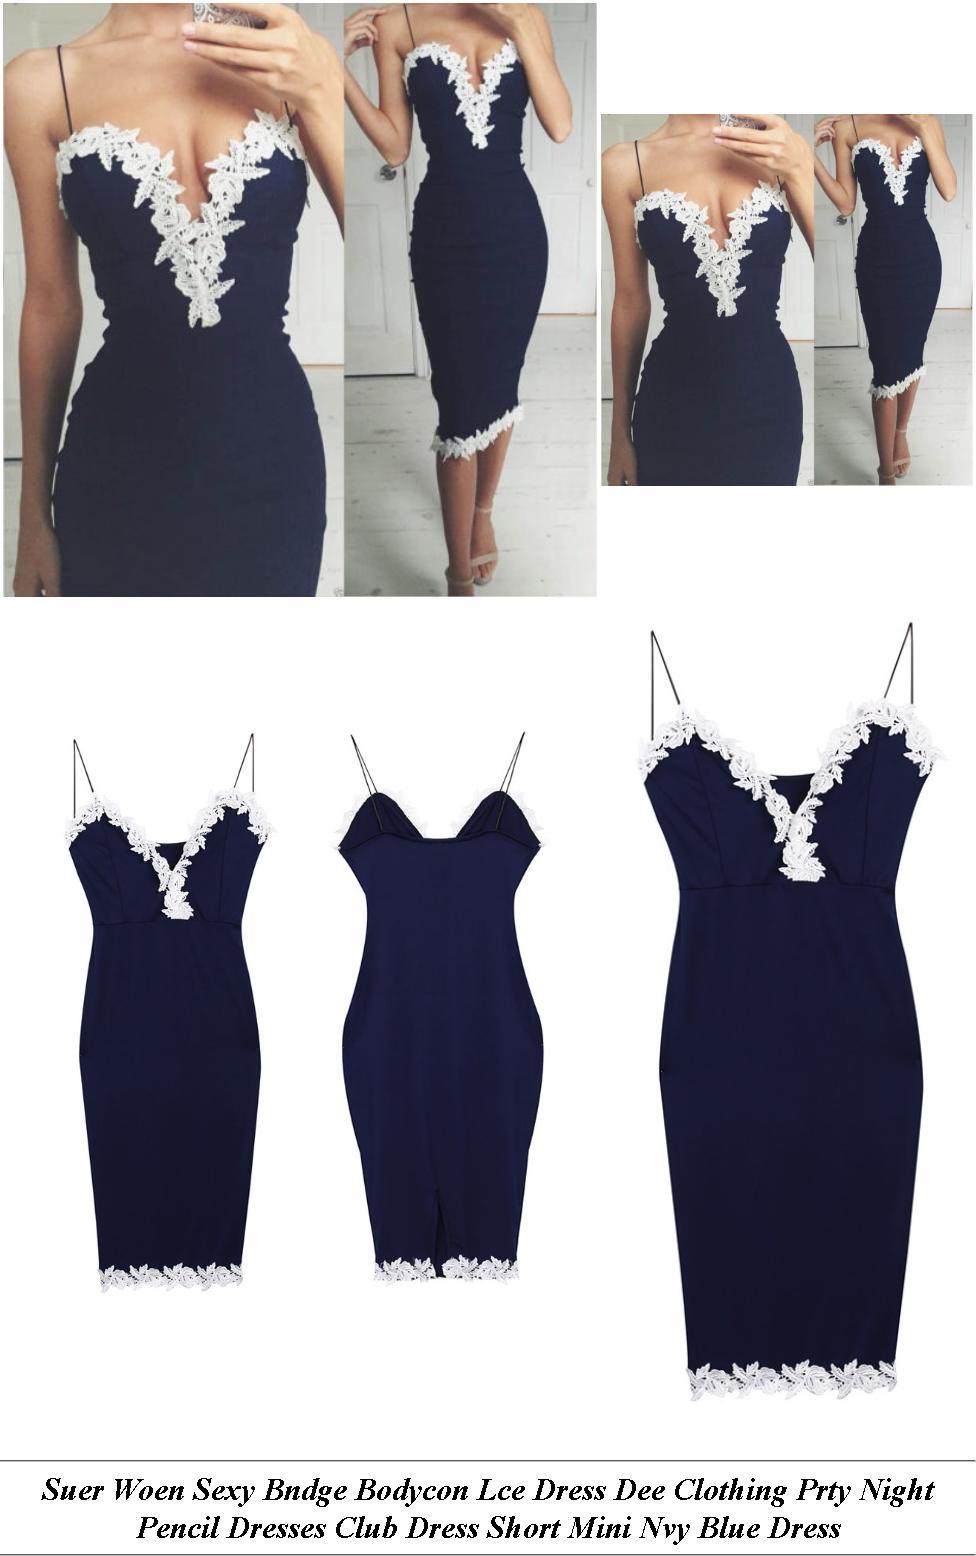 Beach Wedding Dresses - 70 Off Sale - Denim Dress - Cheap Womens Clothes